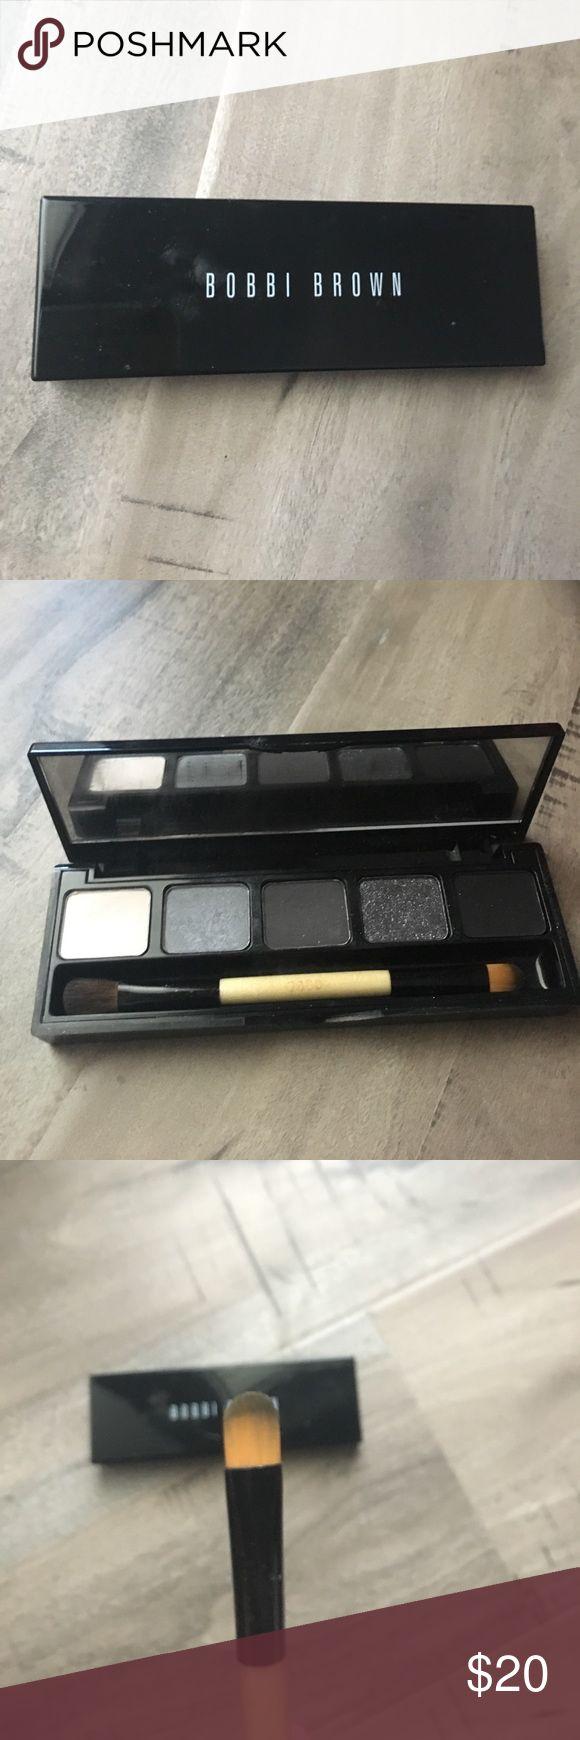 Bobbi brown eyeshadow set! Used this more for the brush than the eyeshadow!make me an offer! Bobbi Brown Makeup Eyeshadow